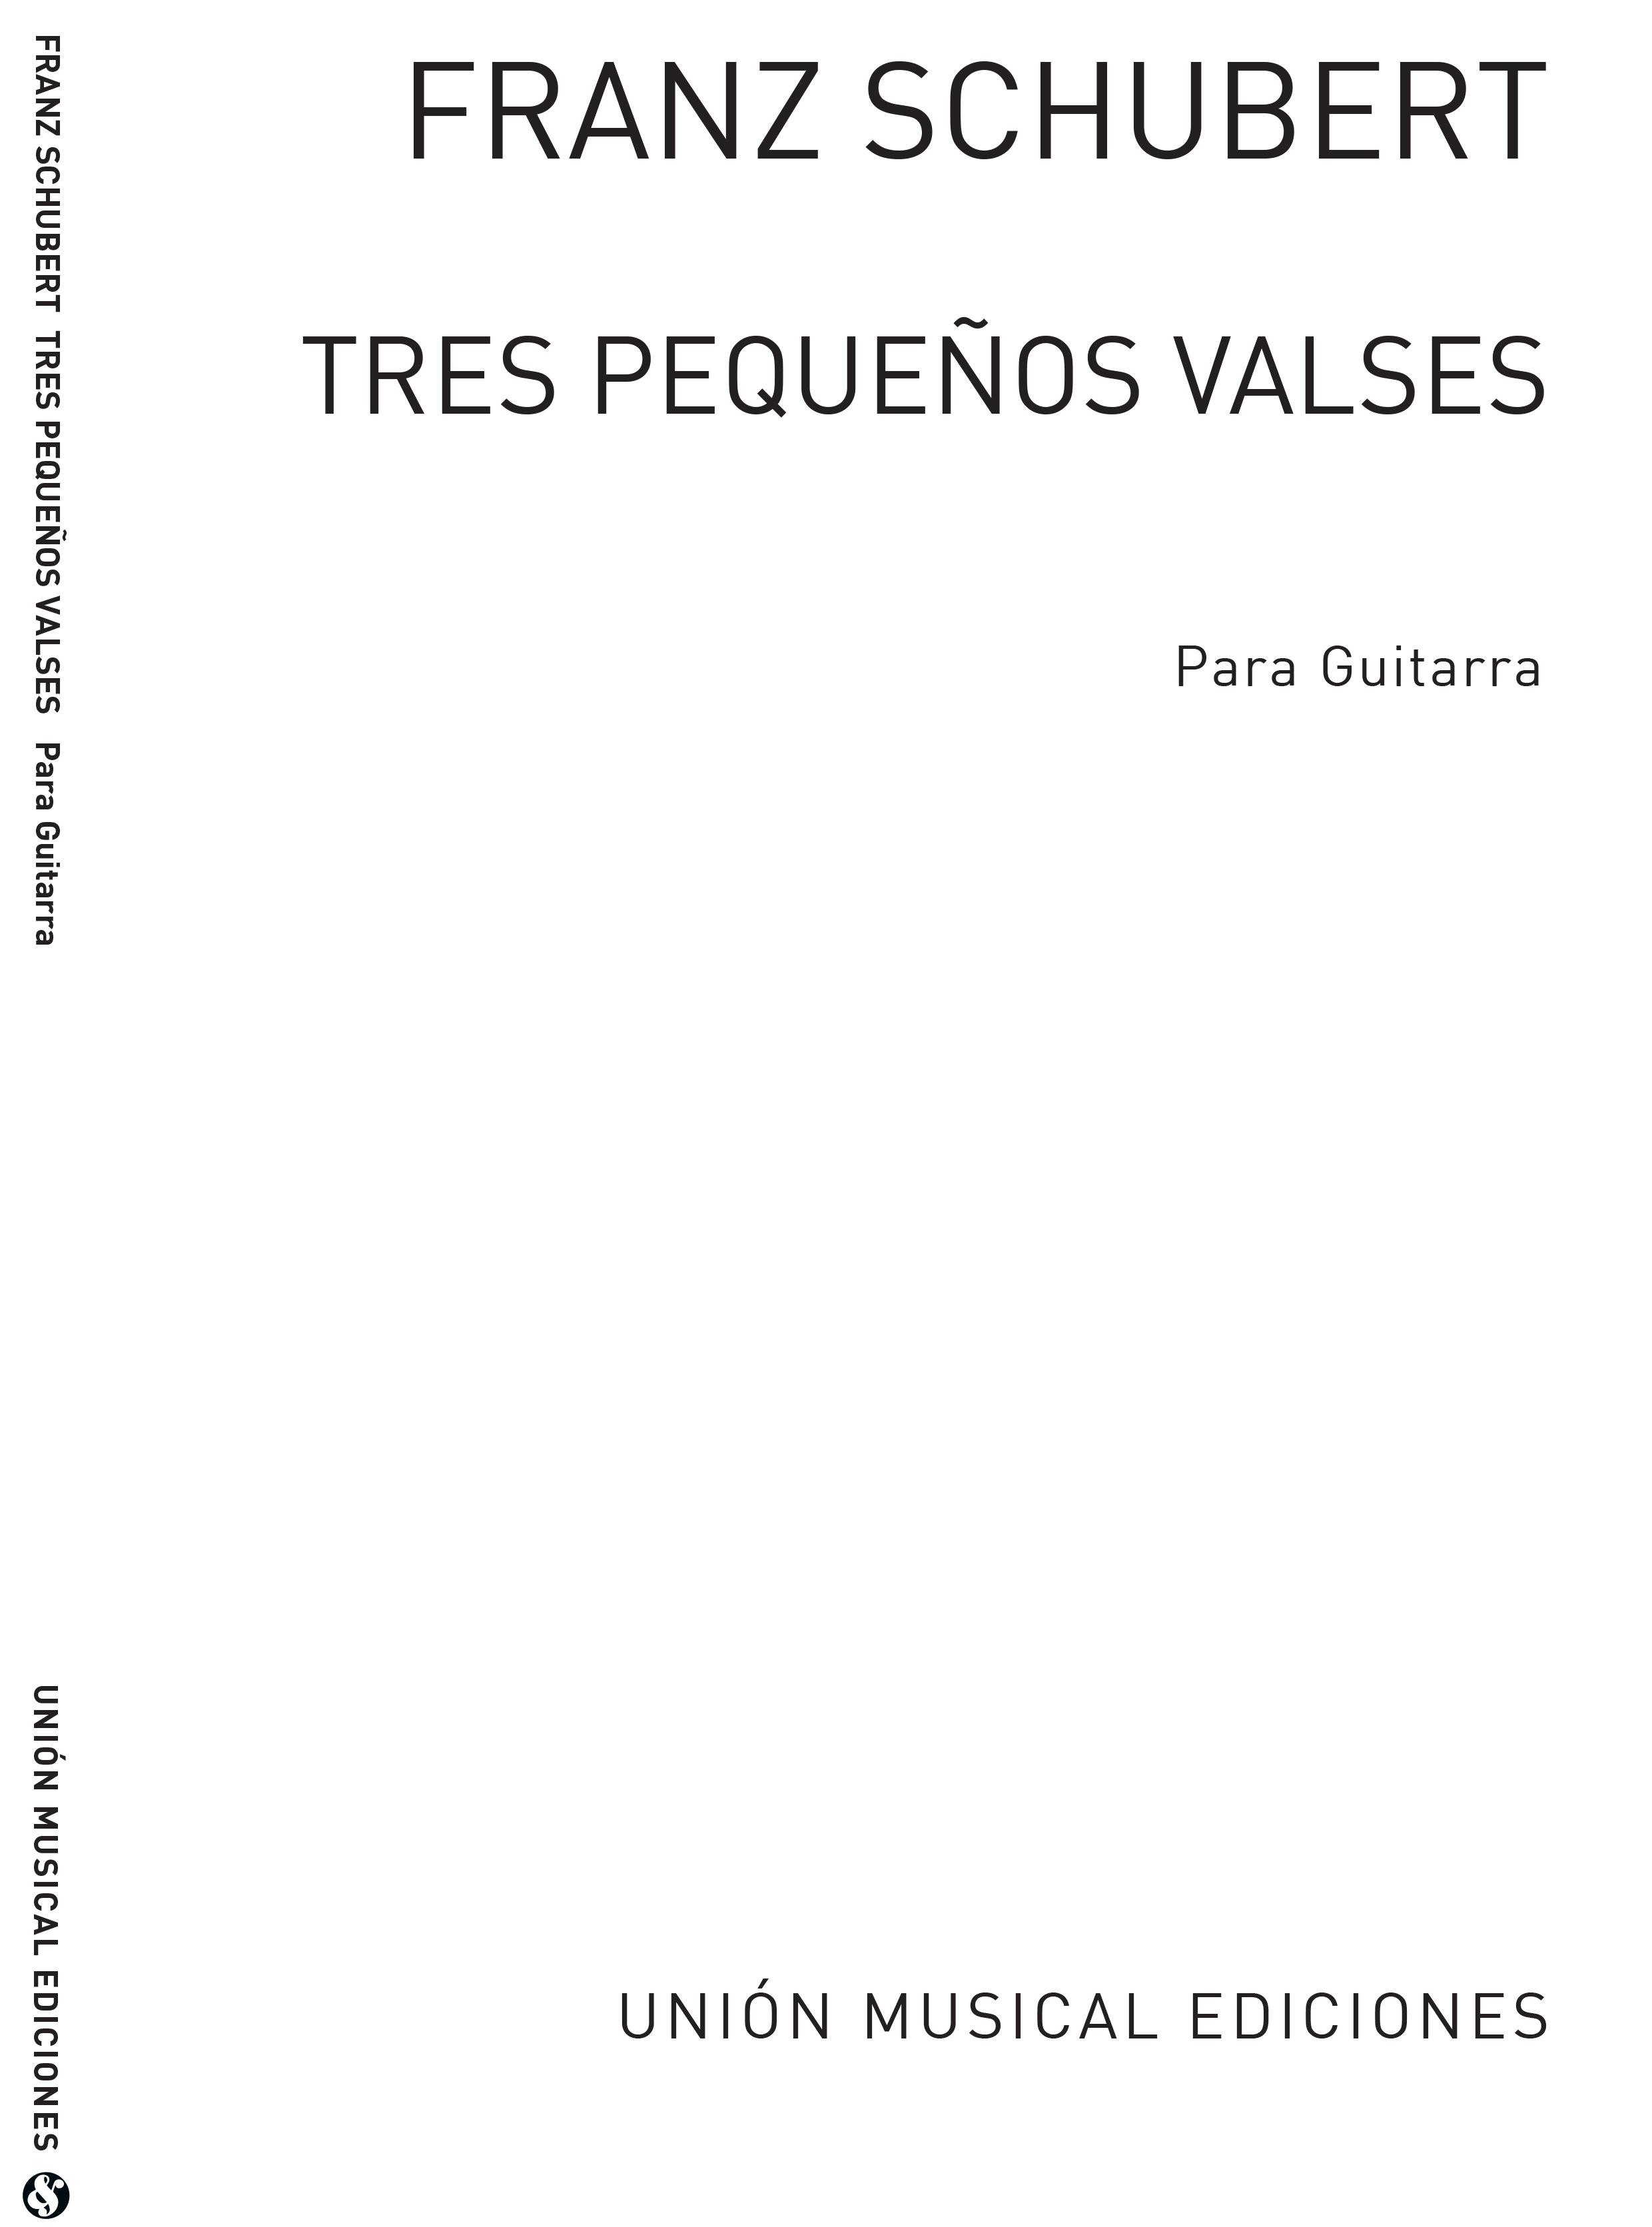 Franz Schubert: Tres Pequenos Valses: Guitar: Instrumental Album